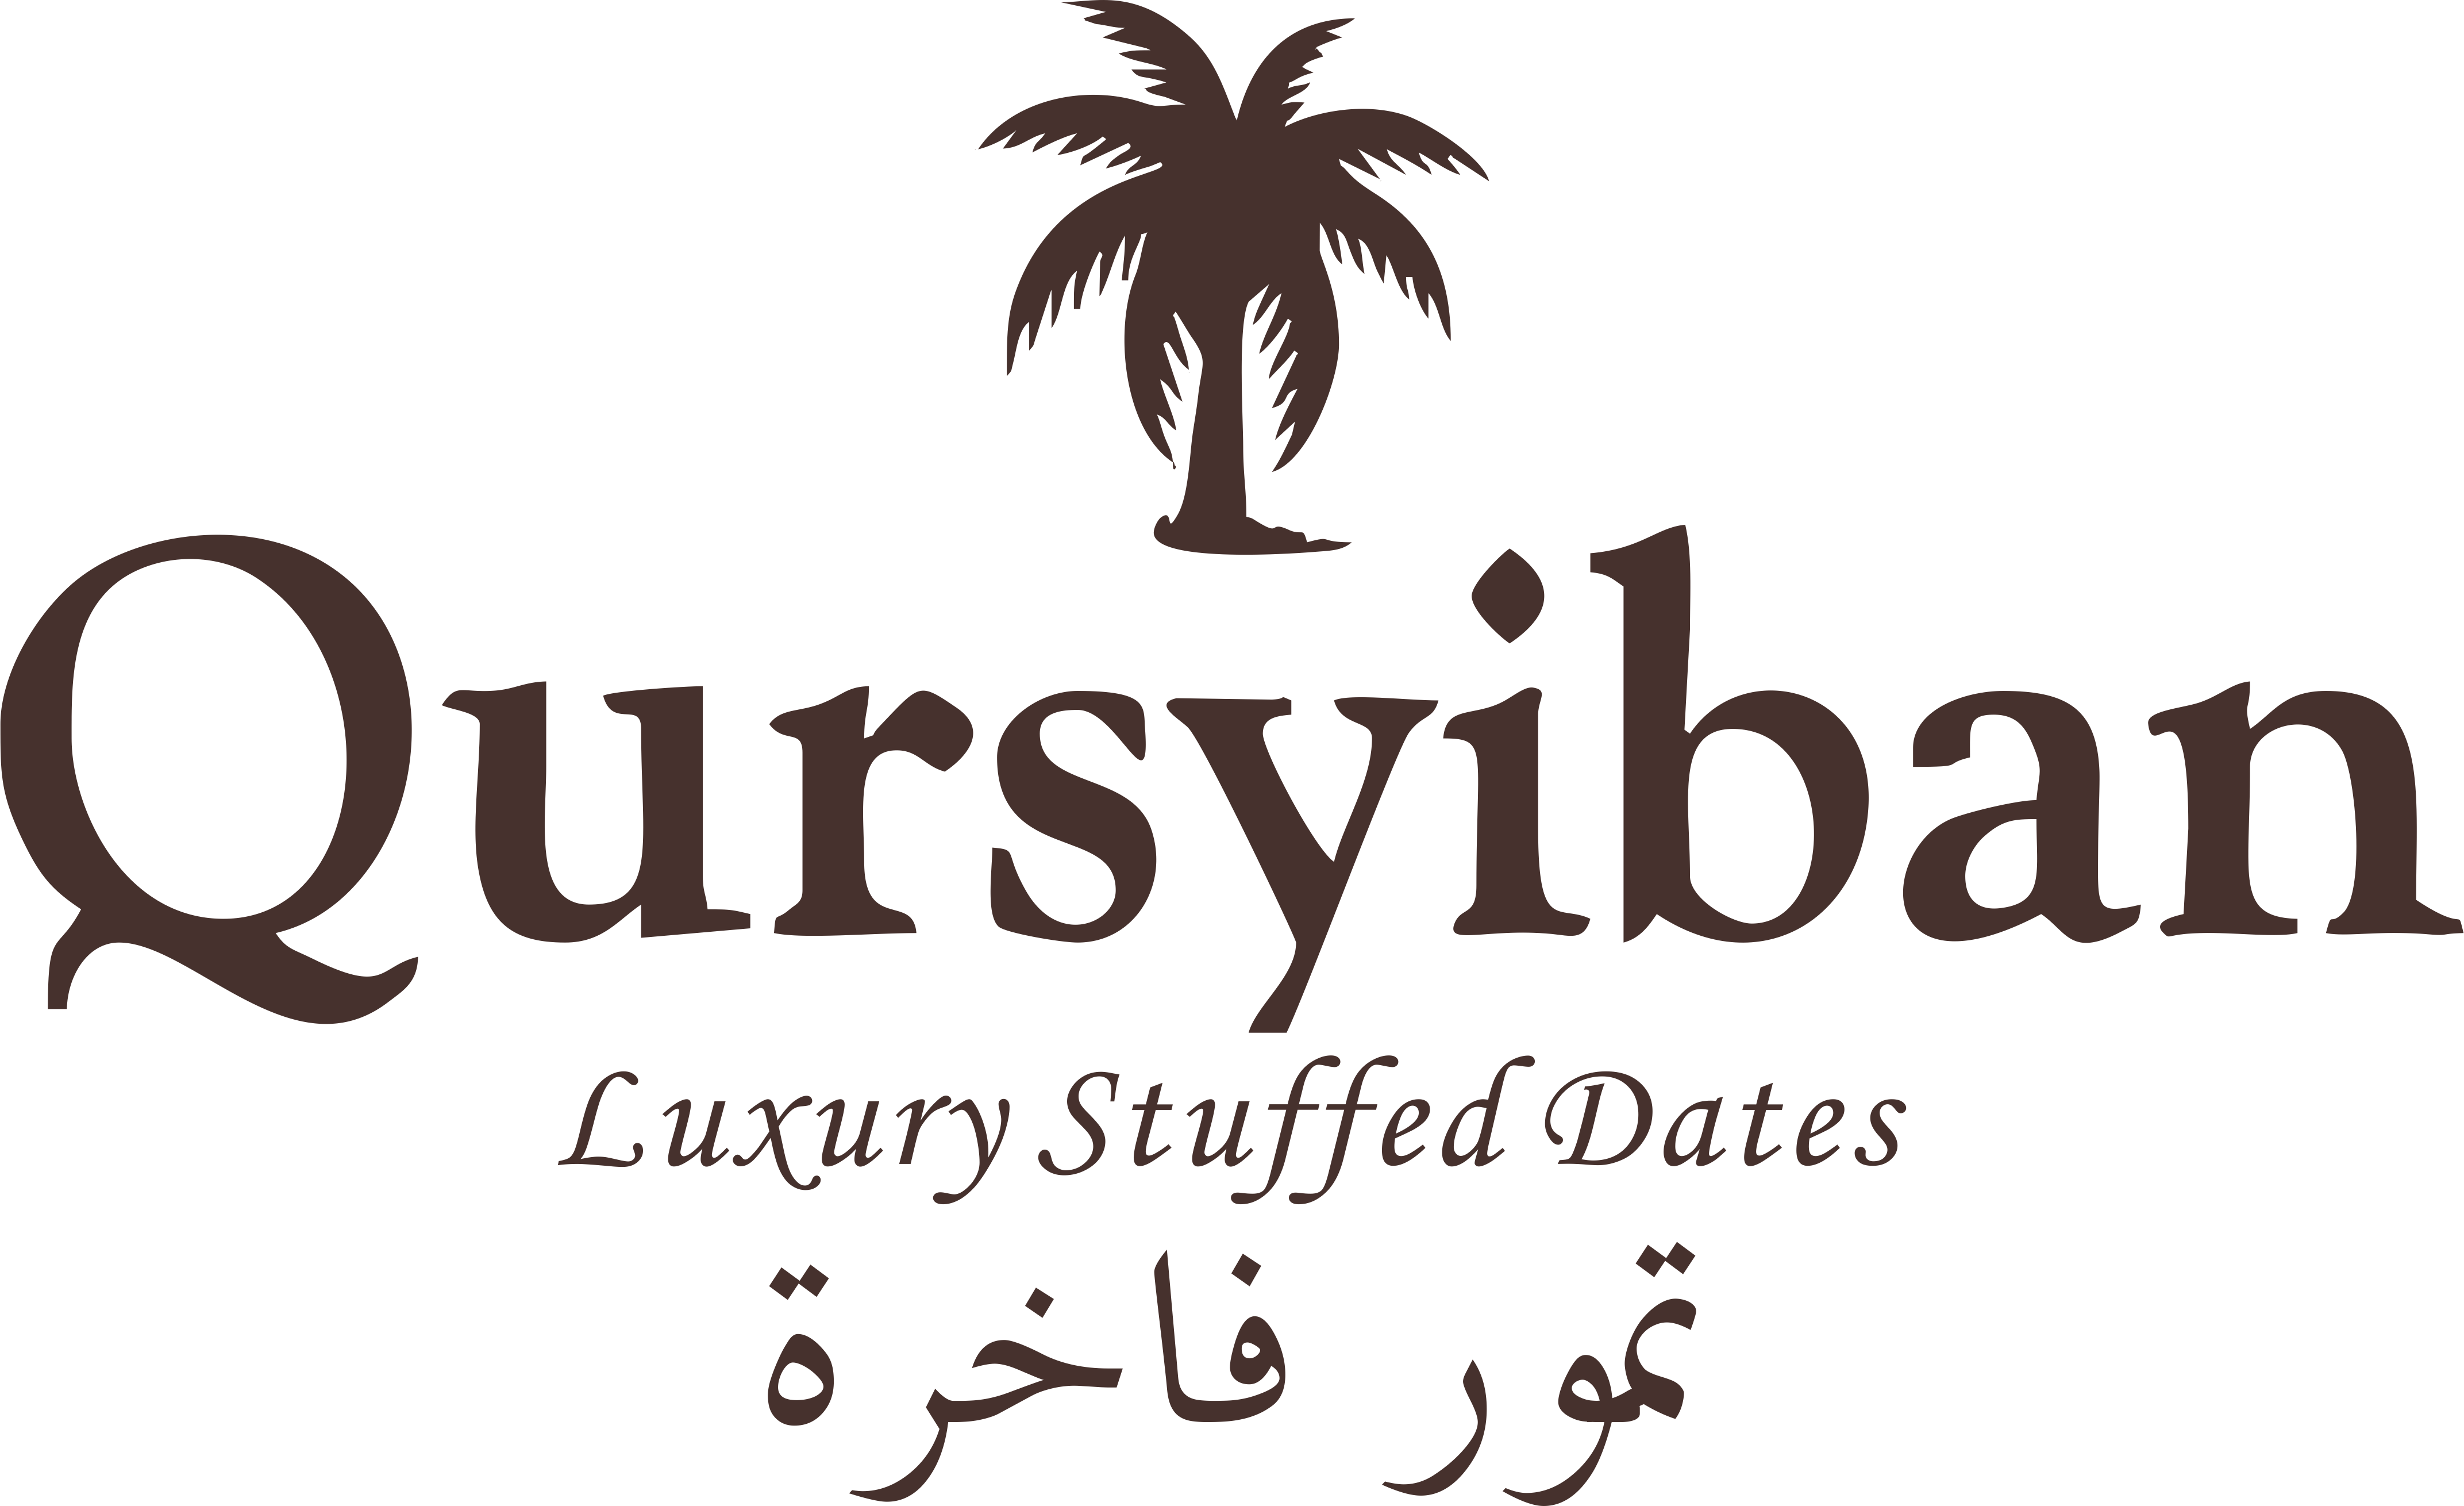 Qursyiban